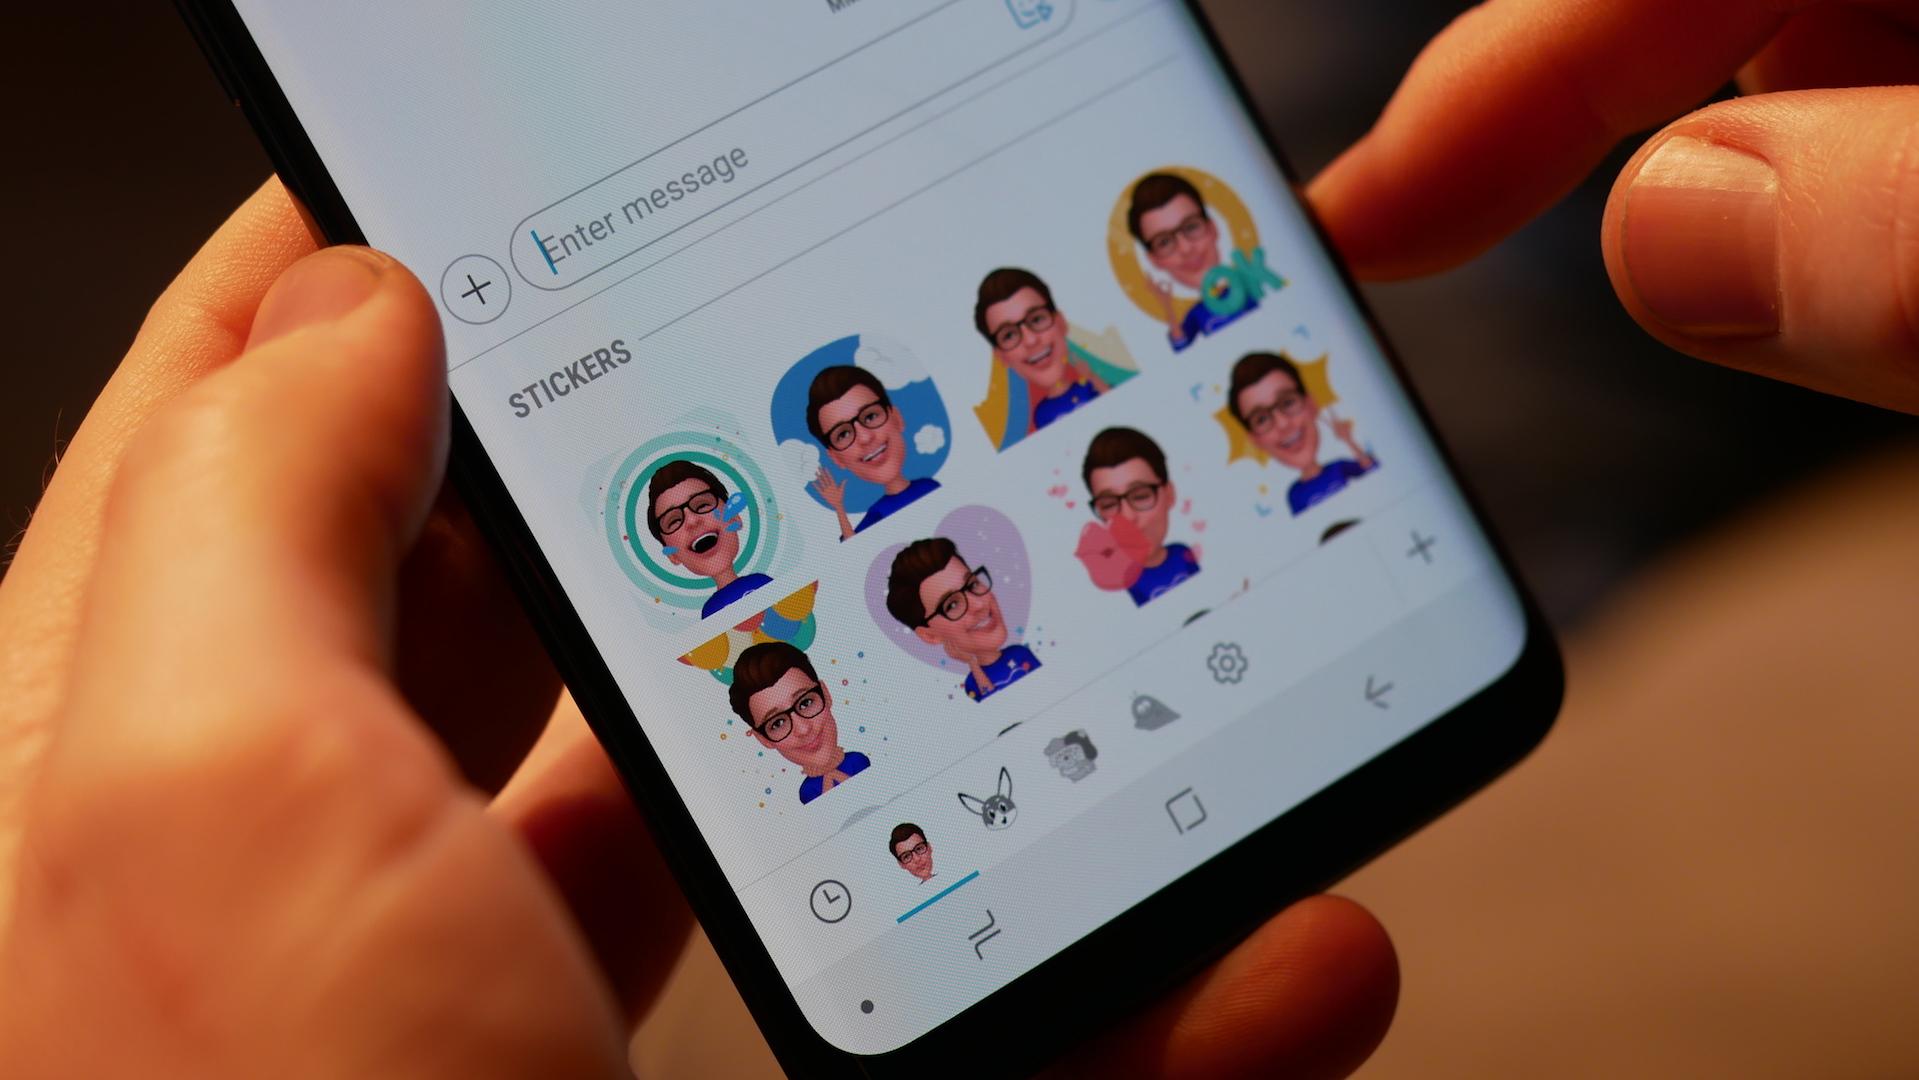 Galaxy A6+ gets AR Emoji in the latest update - SamMobile